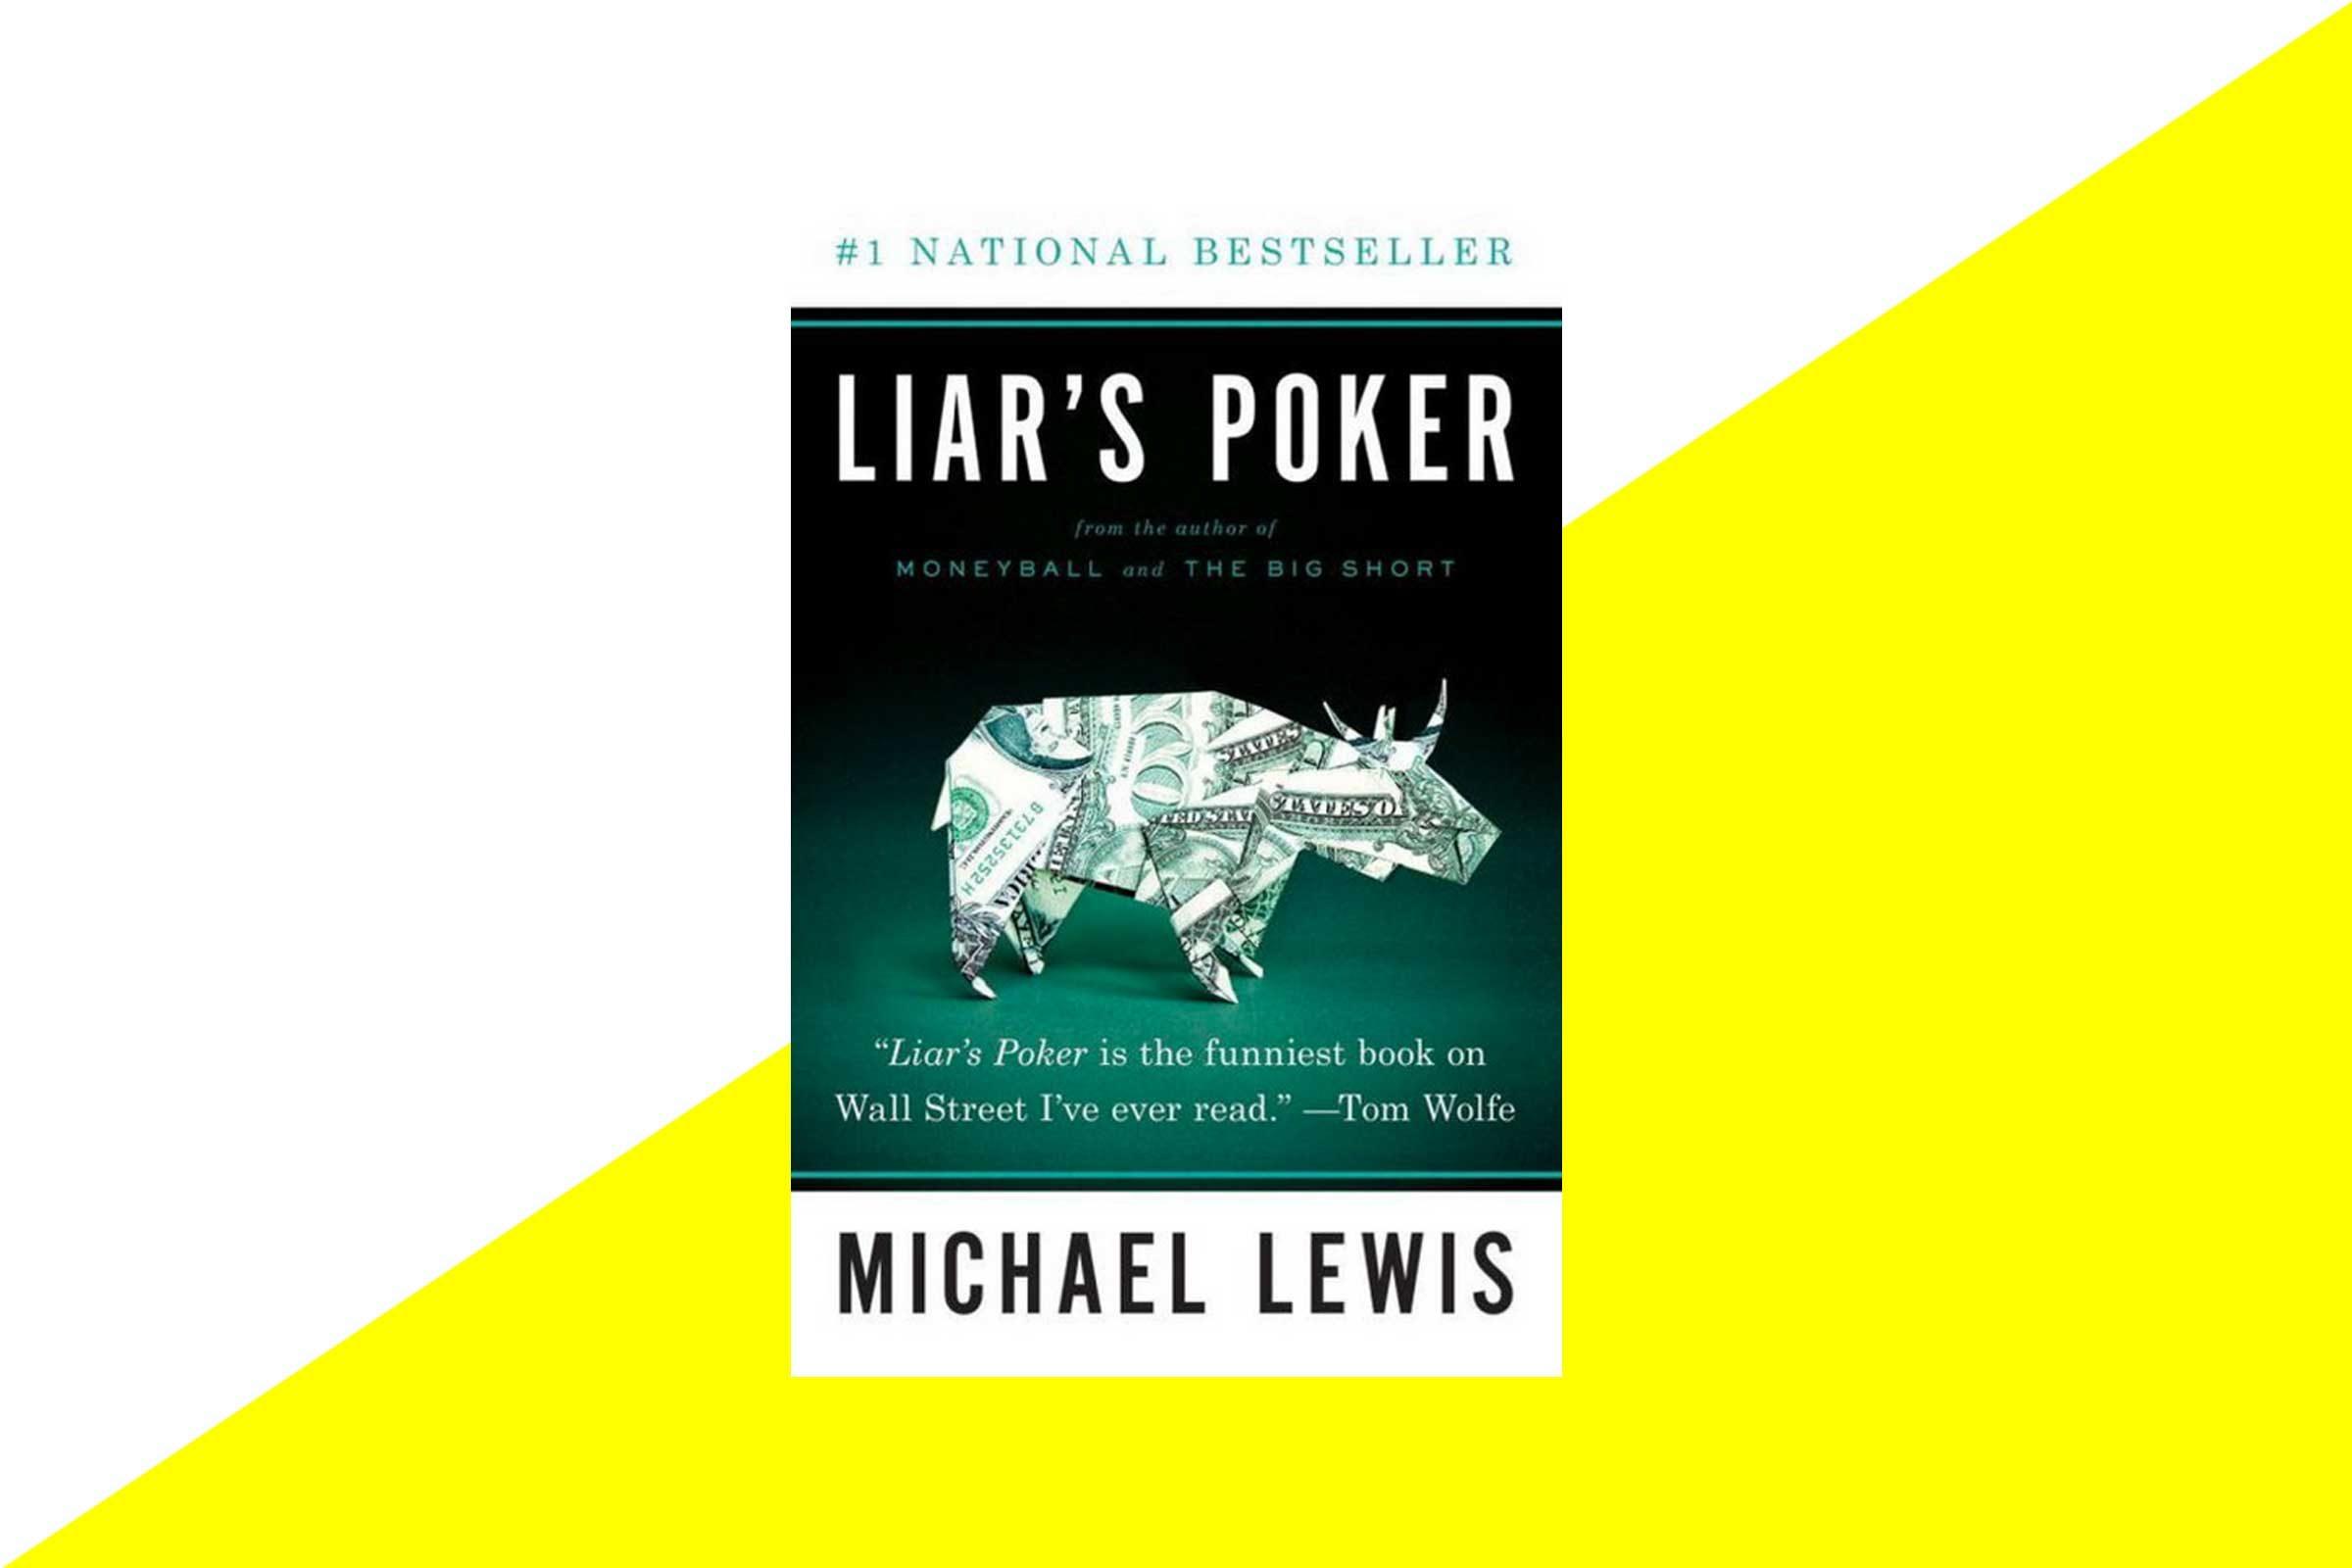 Liar's poker interview questions